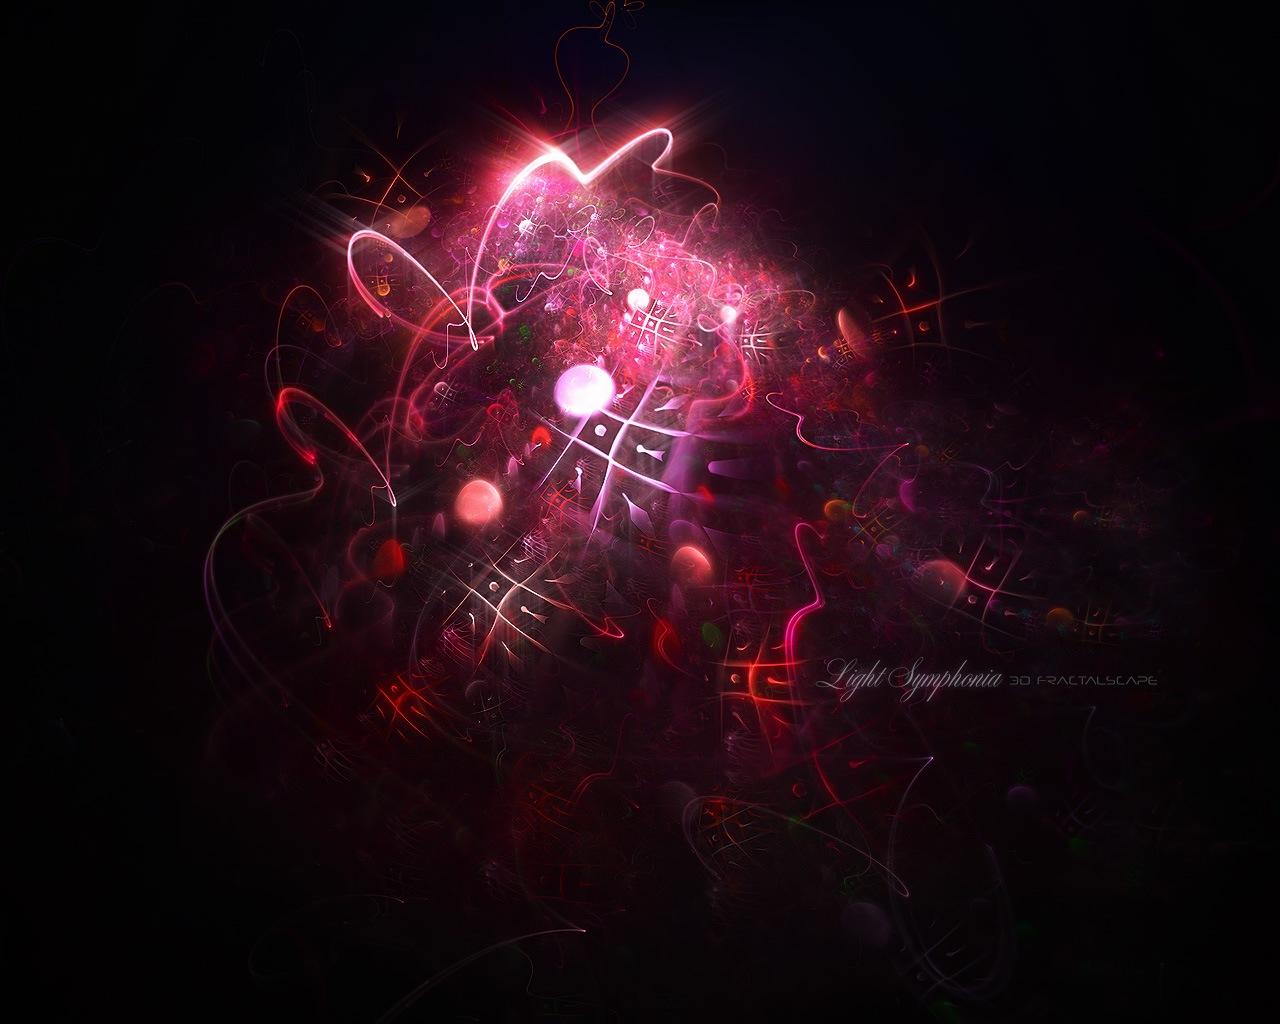 http://4.bp.blogspot.com/-Oi1wa66BBx0/TrOEk5HIBSI/AAAAAAAAF-8/JATaPEVCGRI/s1600/3D+Night+Wallpapers+%252824%2529.jpg